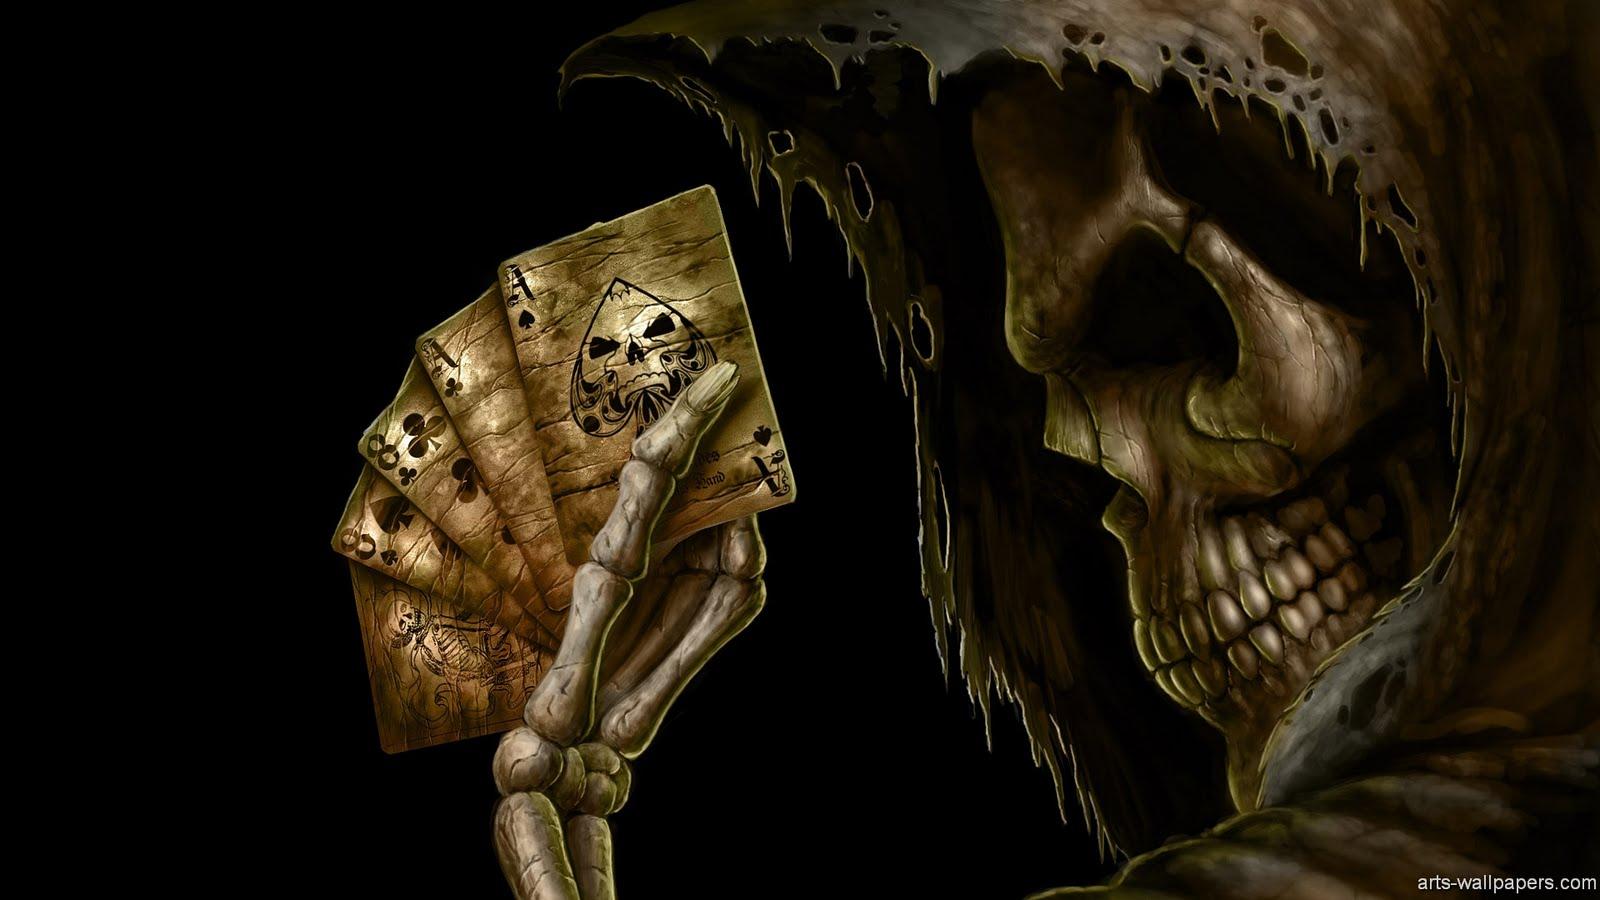 http://4.bp.blogspot.com/-BUSwS9ofJ-0/Ttzpyp4ThLI/AAAAAAAAAzA/k-StlgBnk8E/s1600/the-game-wallpaper-hd-12-717982.jpg